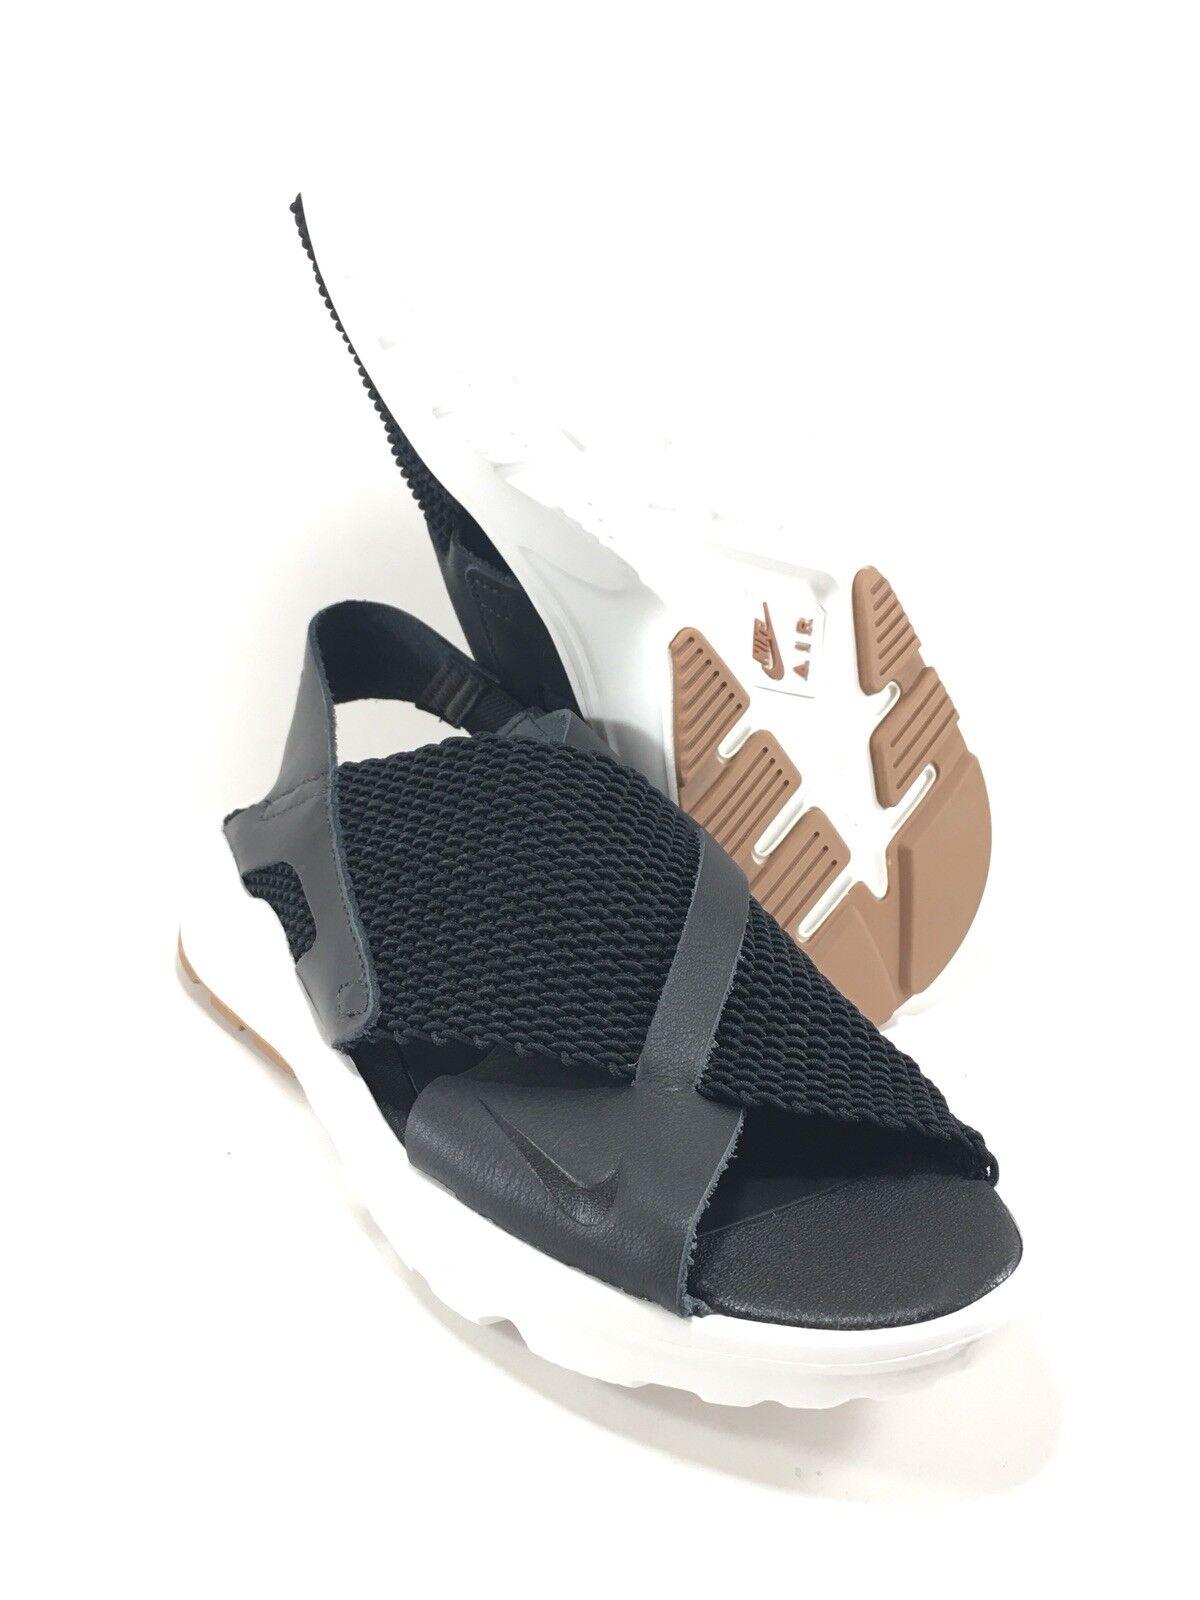 Nike Air Huarach Ultra nero  bianca Slip -On Dimensione 6  Spedizione gratuita per tutti gli ordini